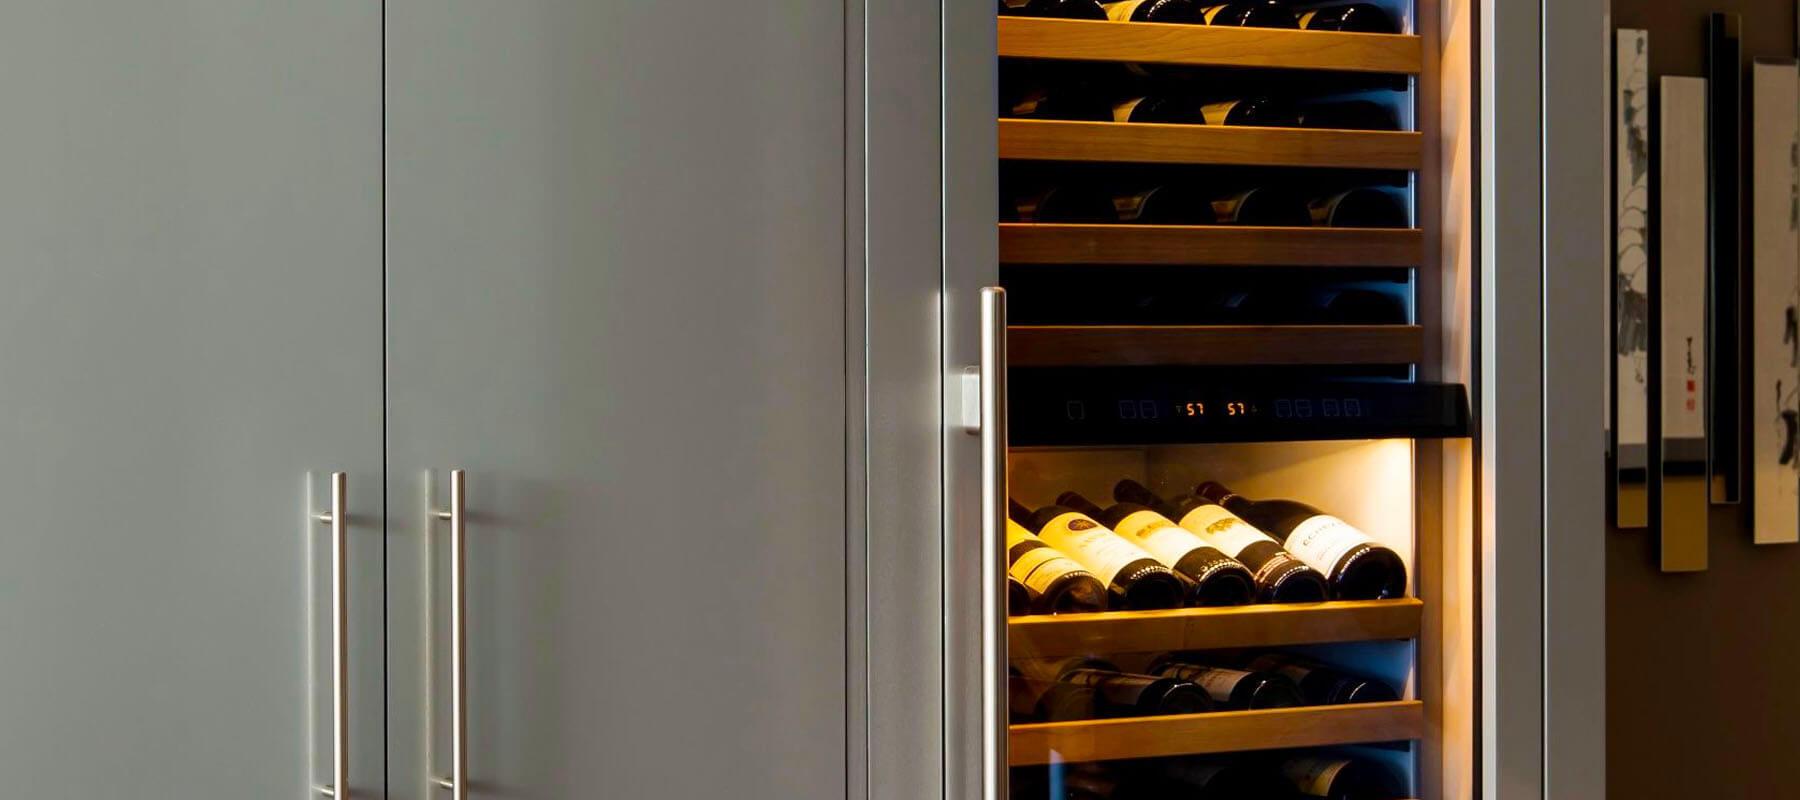 Built in Wine Refrigerator Palos Verdes Peninsula | Built-in Refrigerator Repair